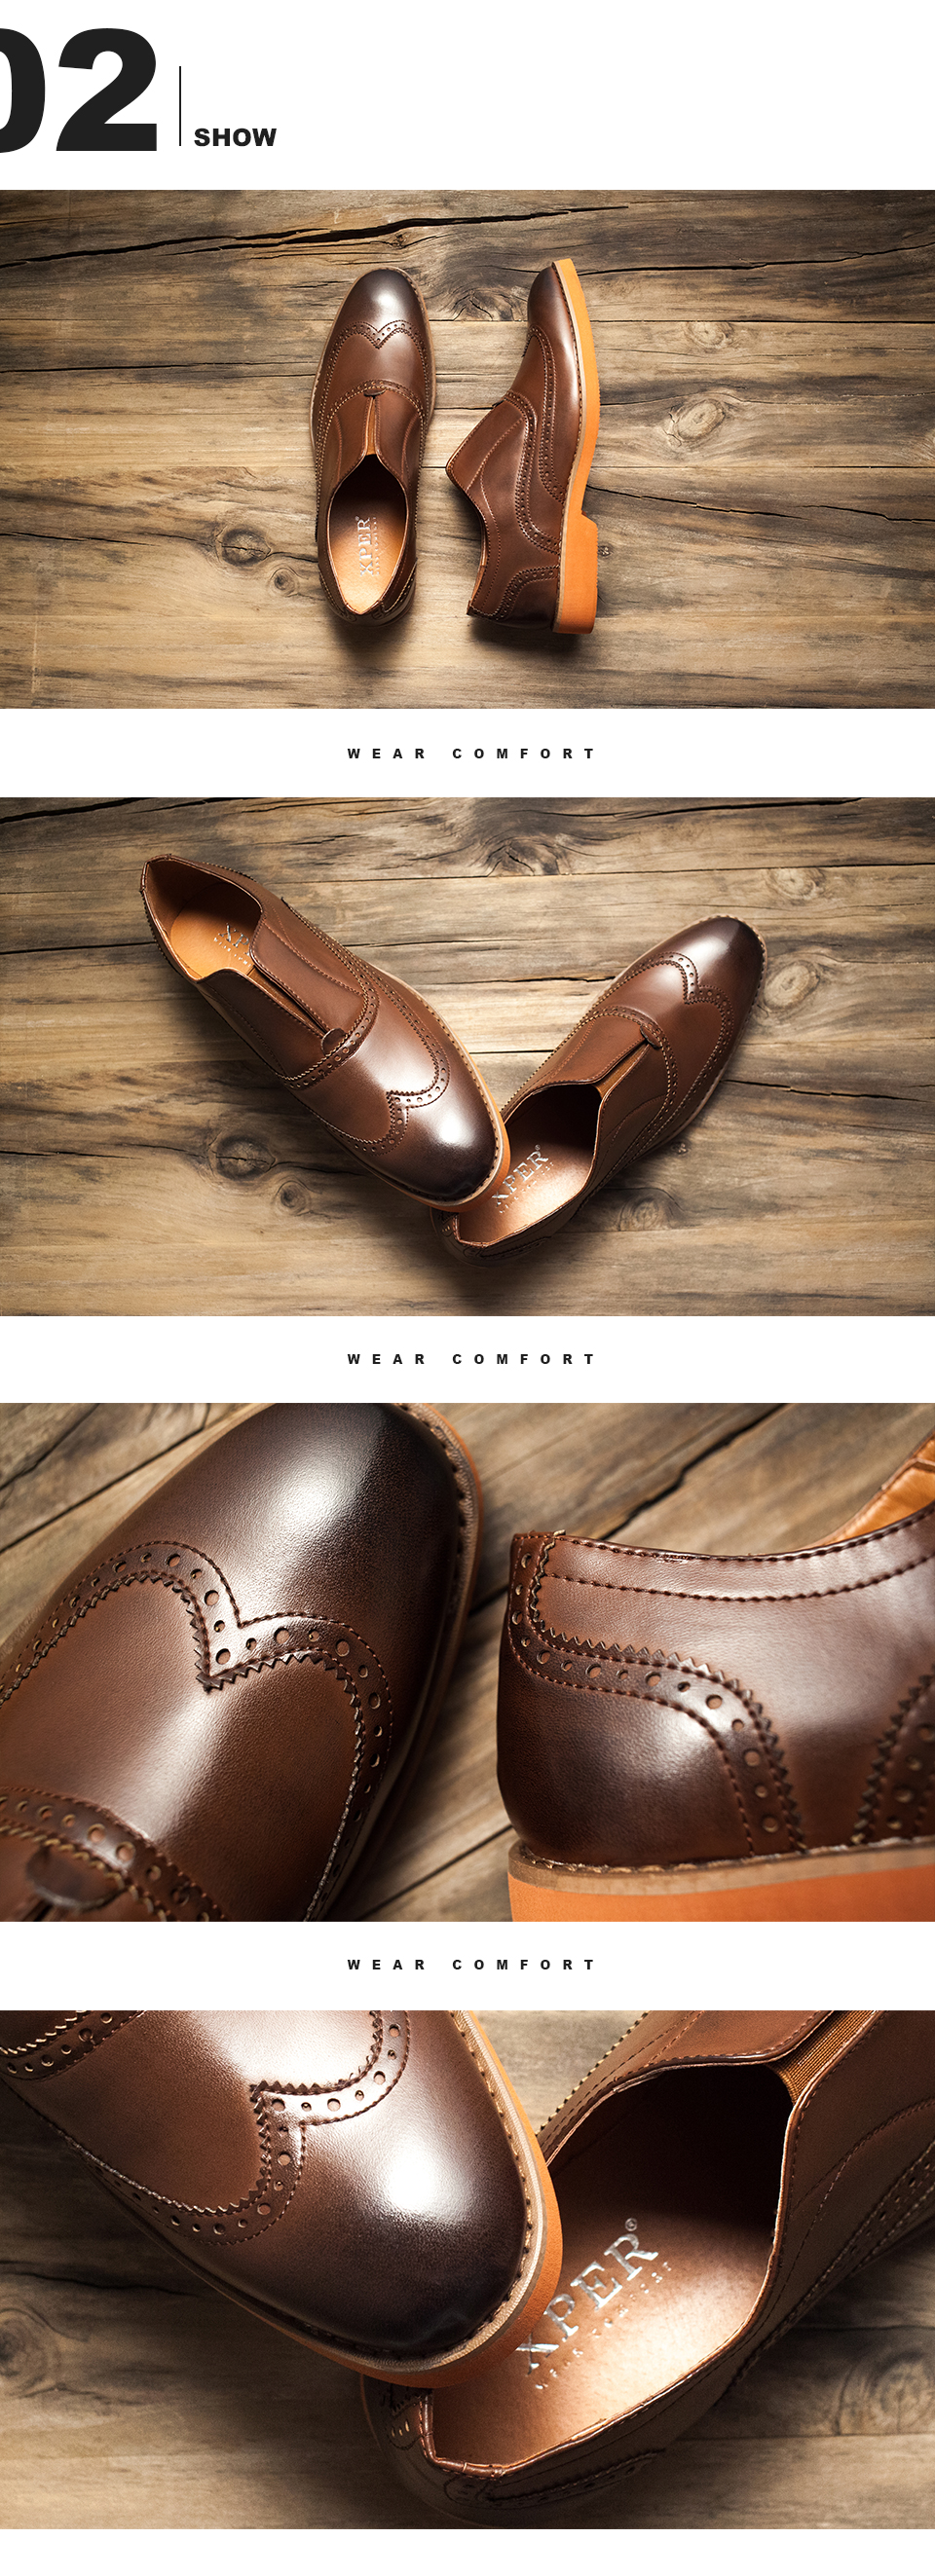 XPER Brand Fashion Men Loafers Brogue Business Shoes Men Casual Dress Shoes Retro Footwear Male Shoes Wear Comfortable #XAF86761